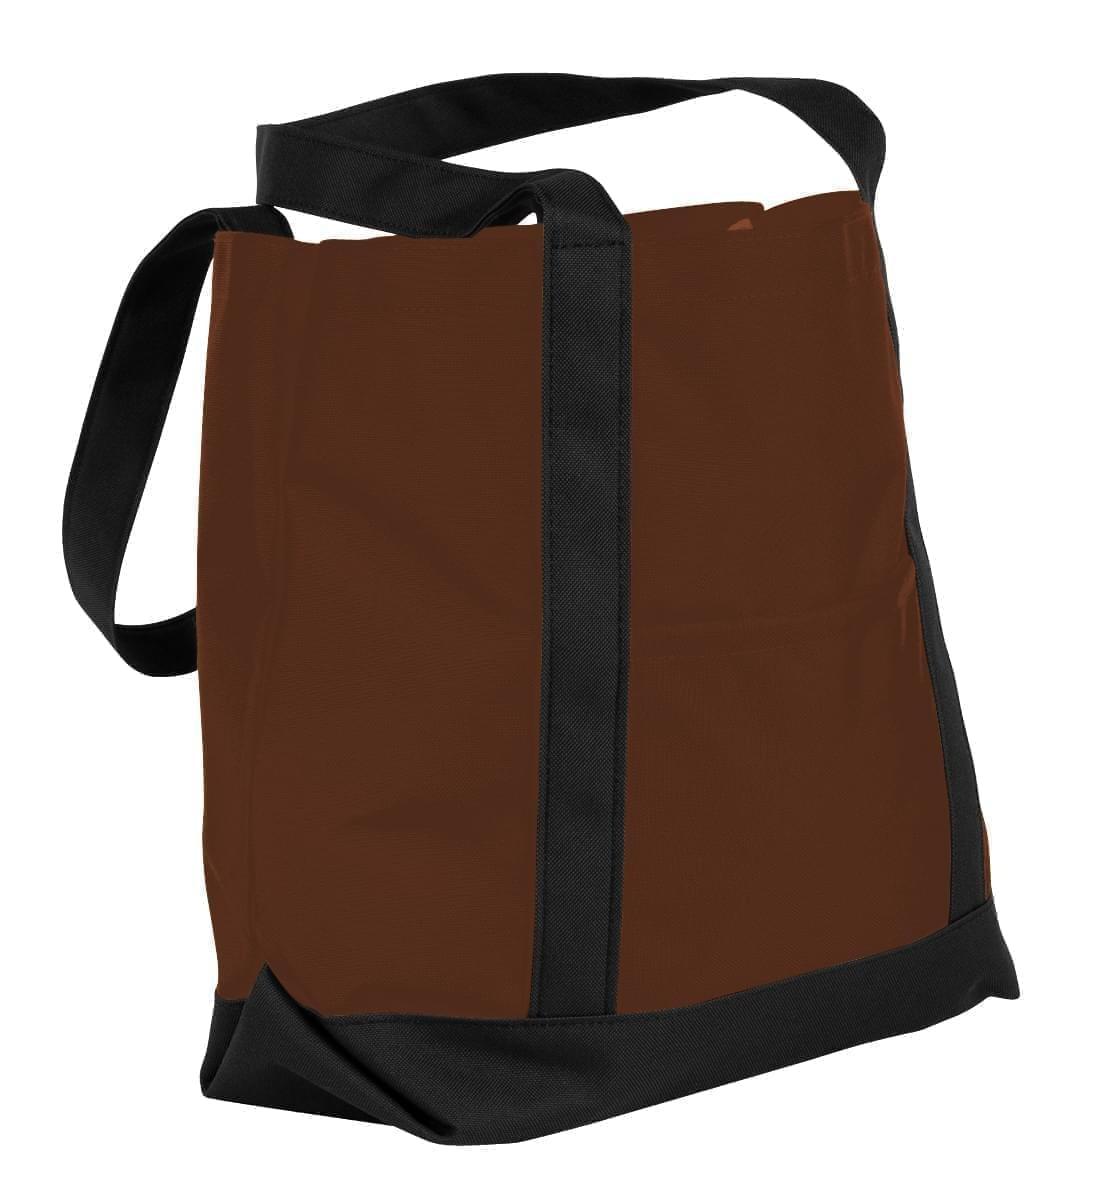 USA Made Canvas Fashion Tote Bags, Brown-Black, XAACL1UAAC